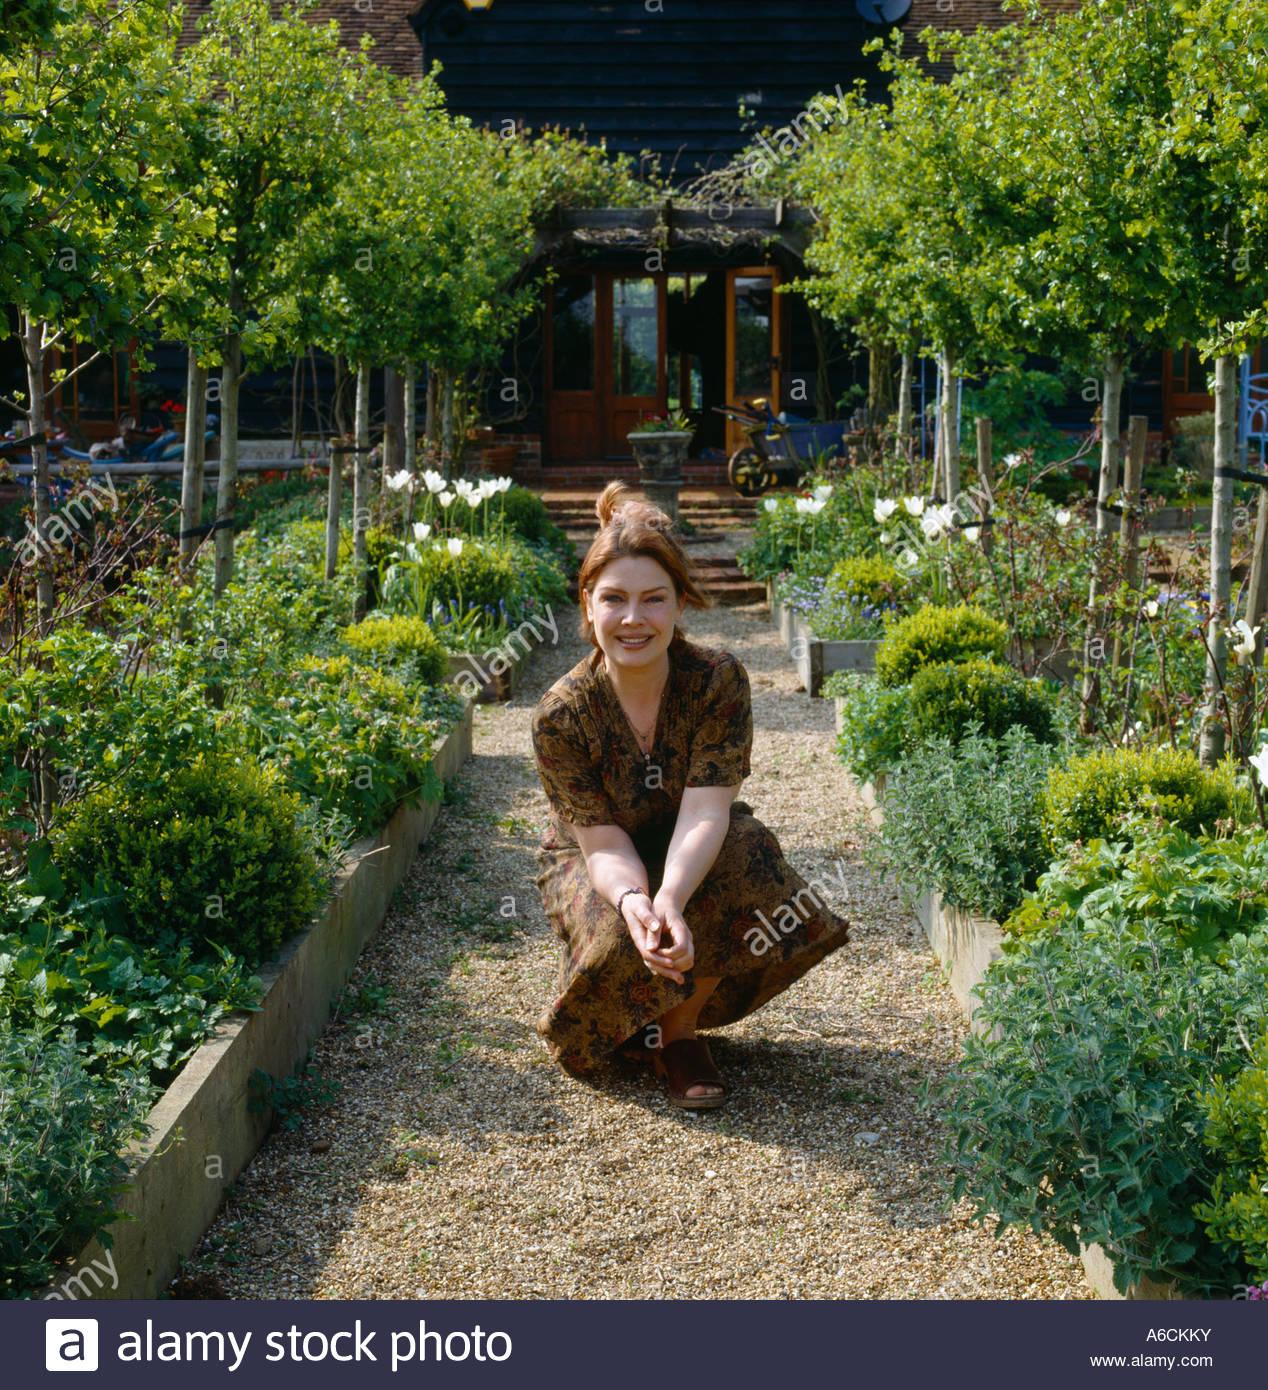 kim wilde in her garden 2003 stock image - Wilde Garden